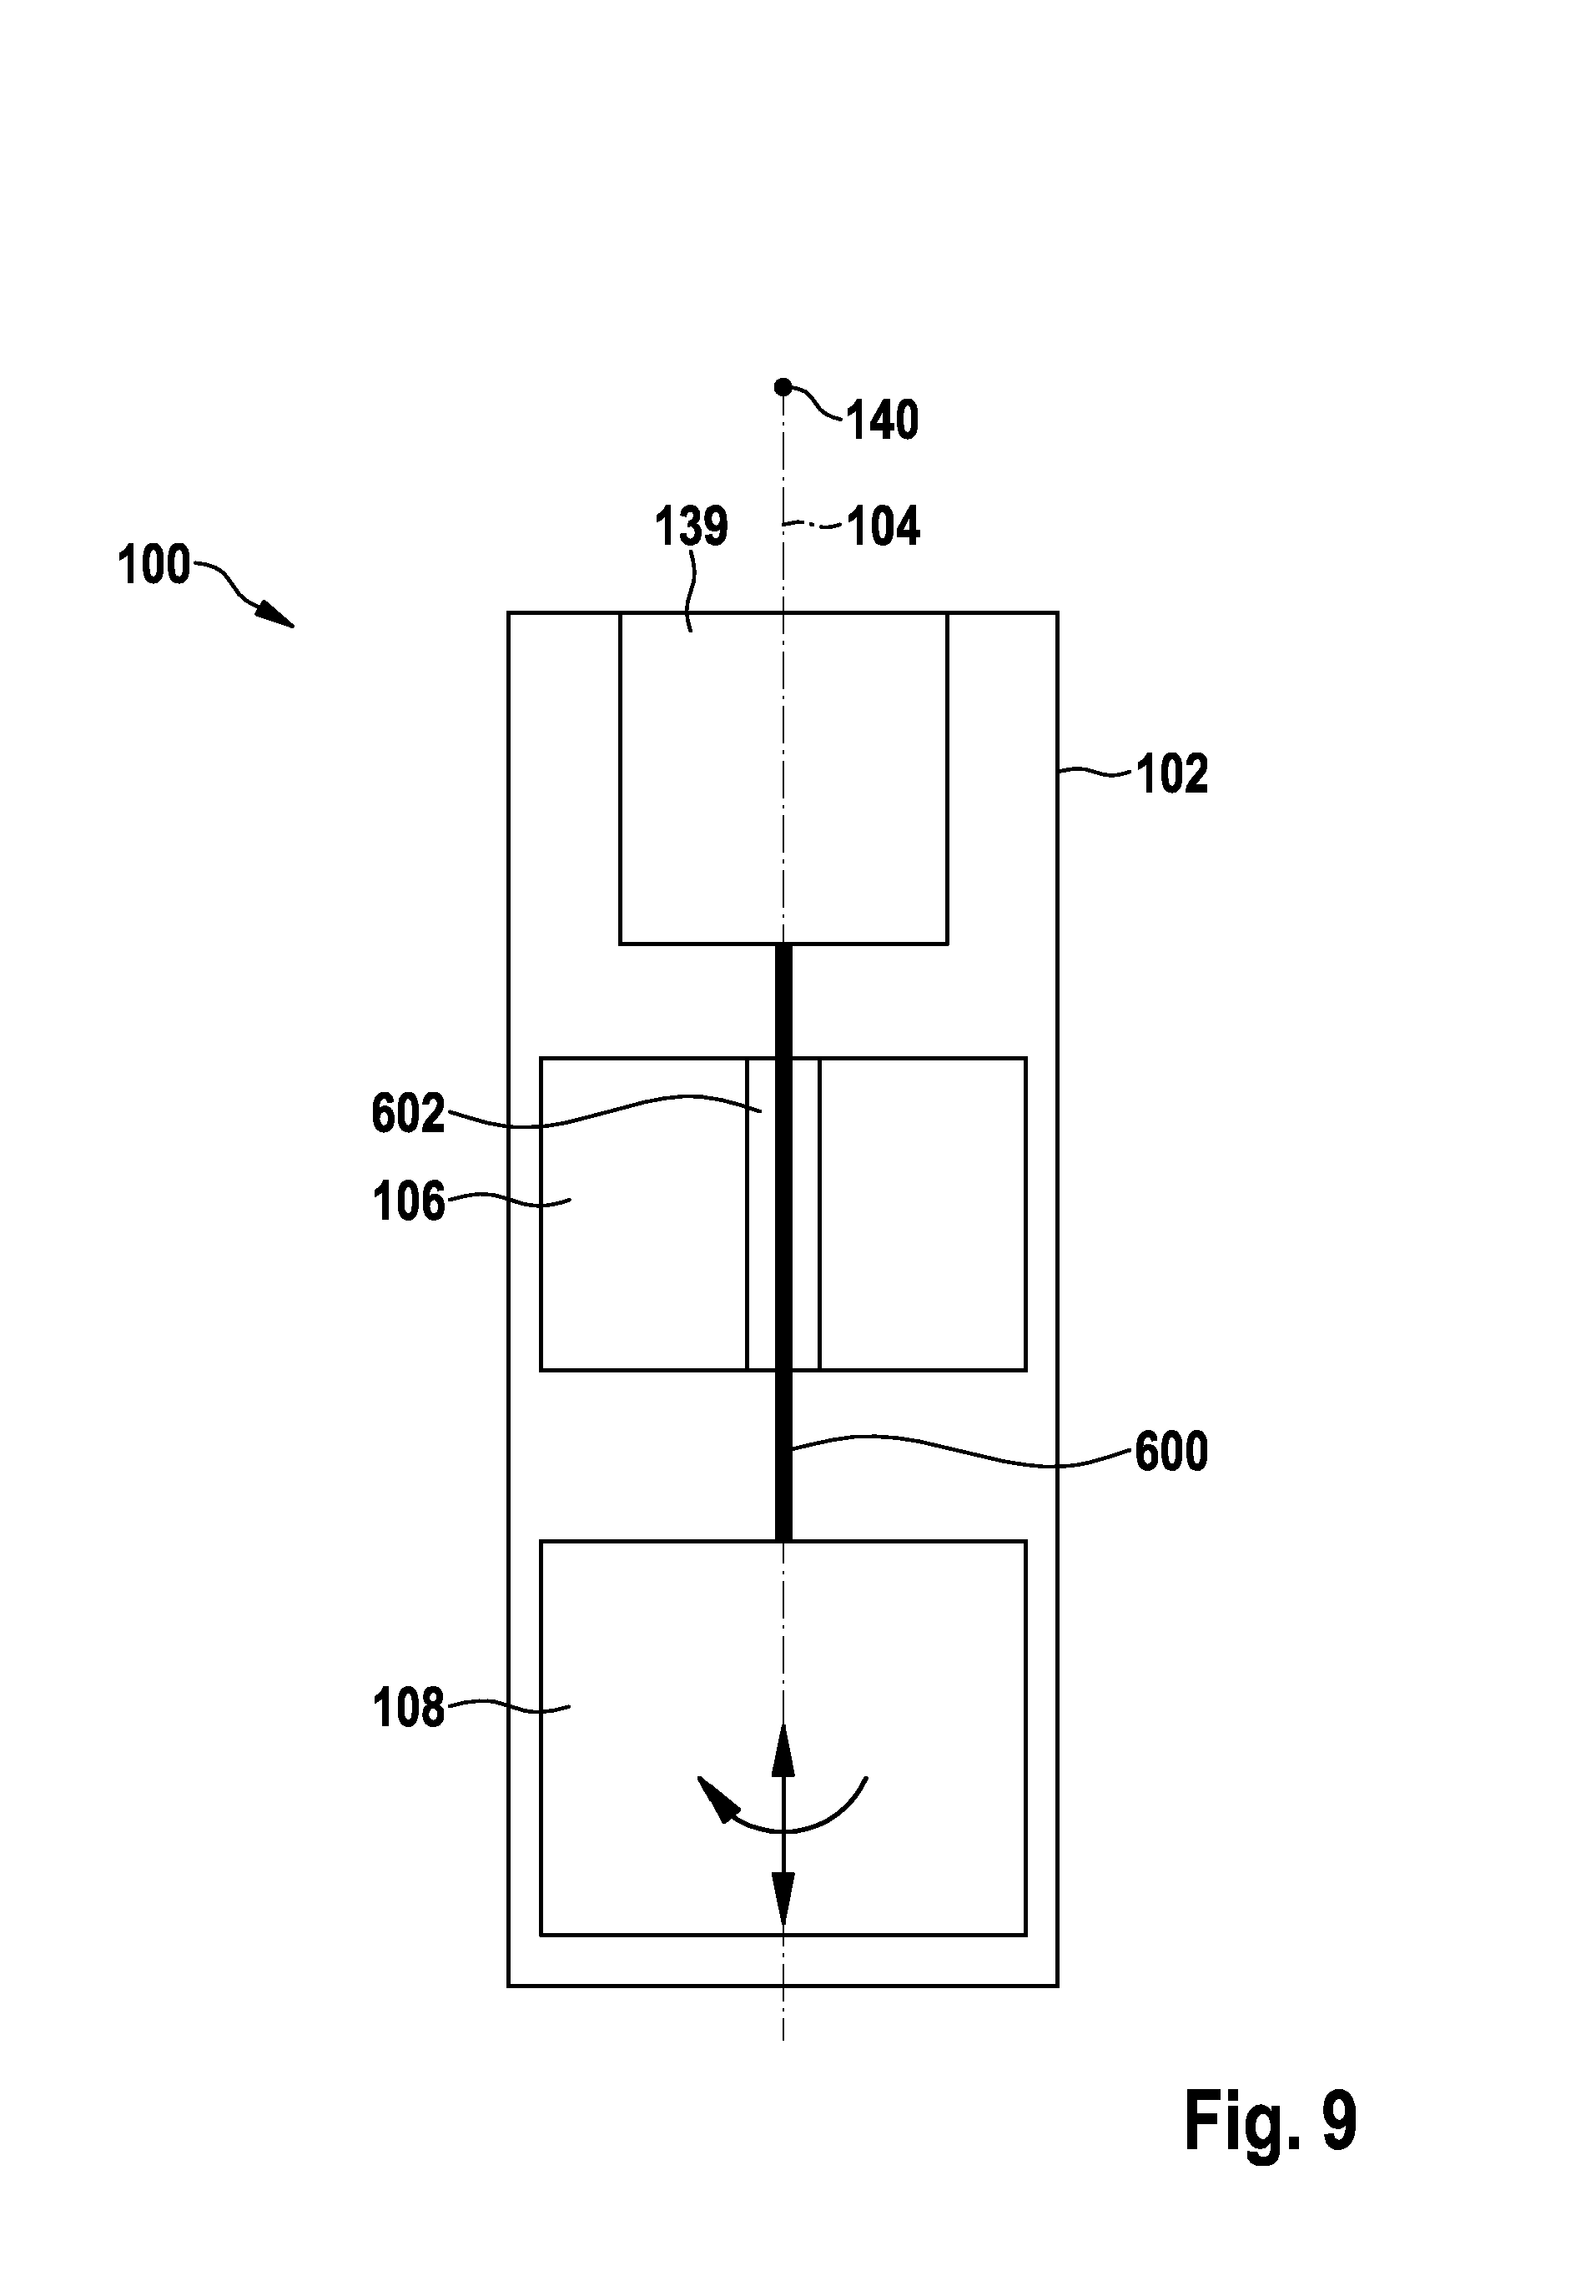 patent ep2532426a2 kartusche zentrifuge sowie verfahren google patents. Black Bedroom Furniture Sets. Home Design Ideas